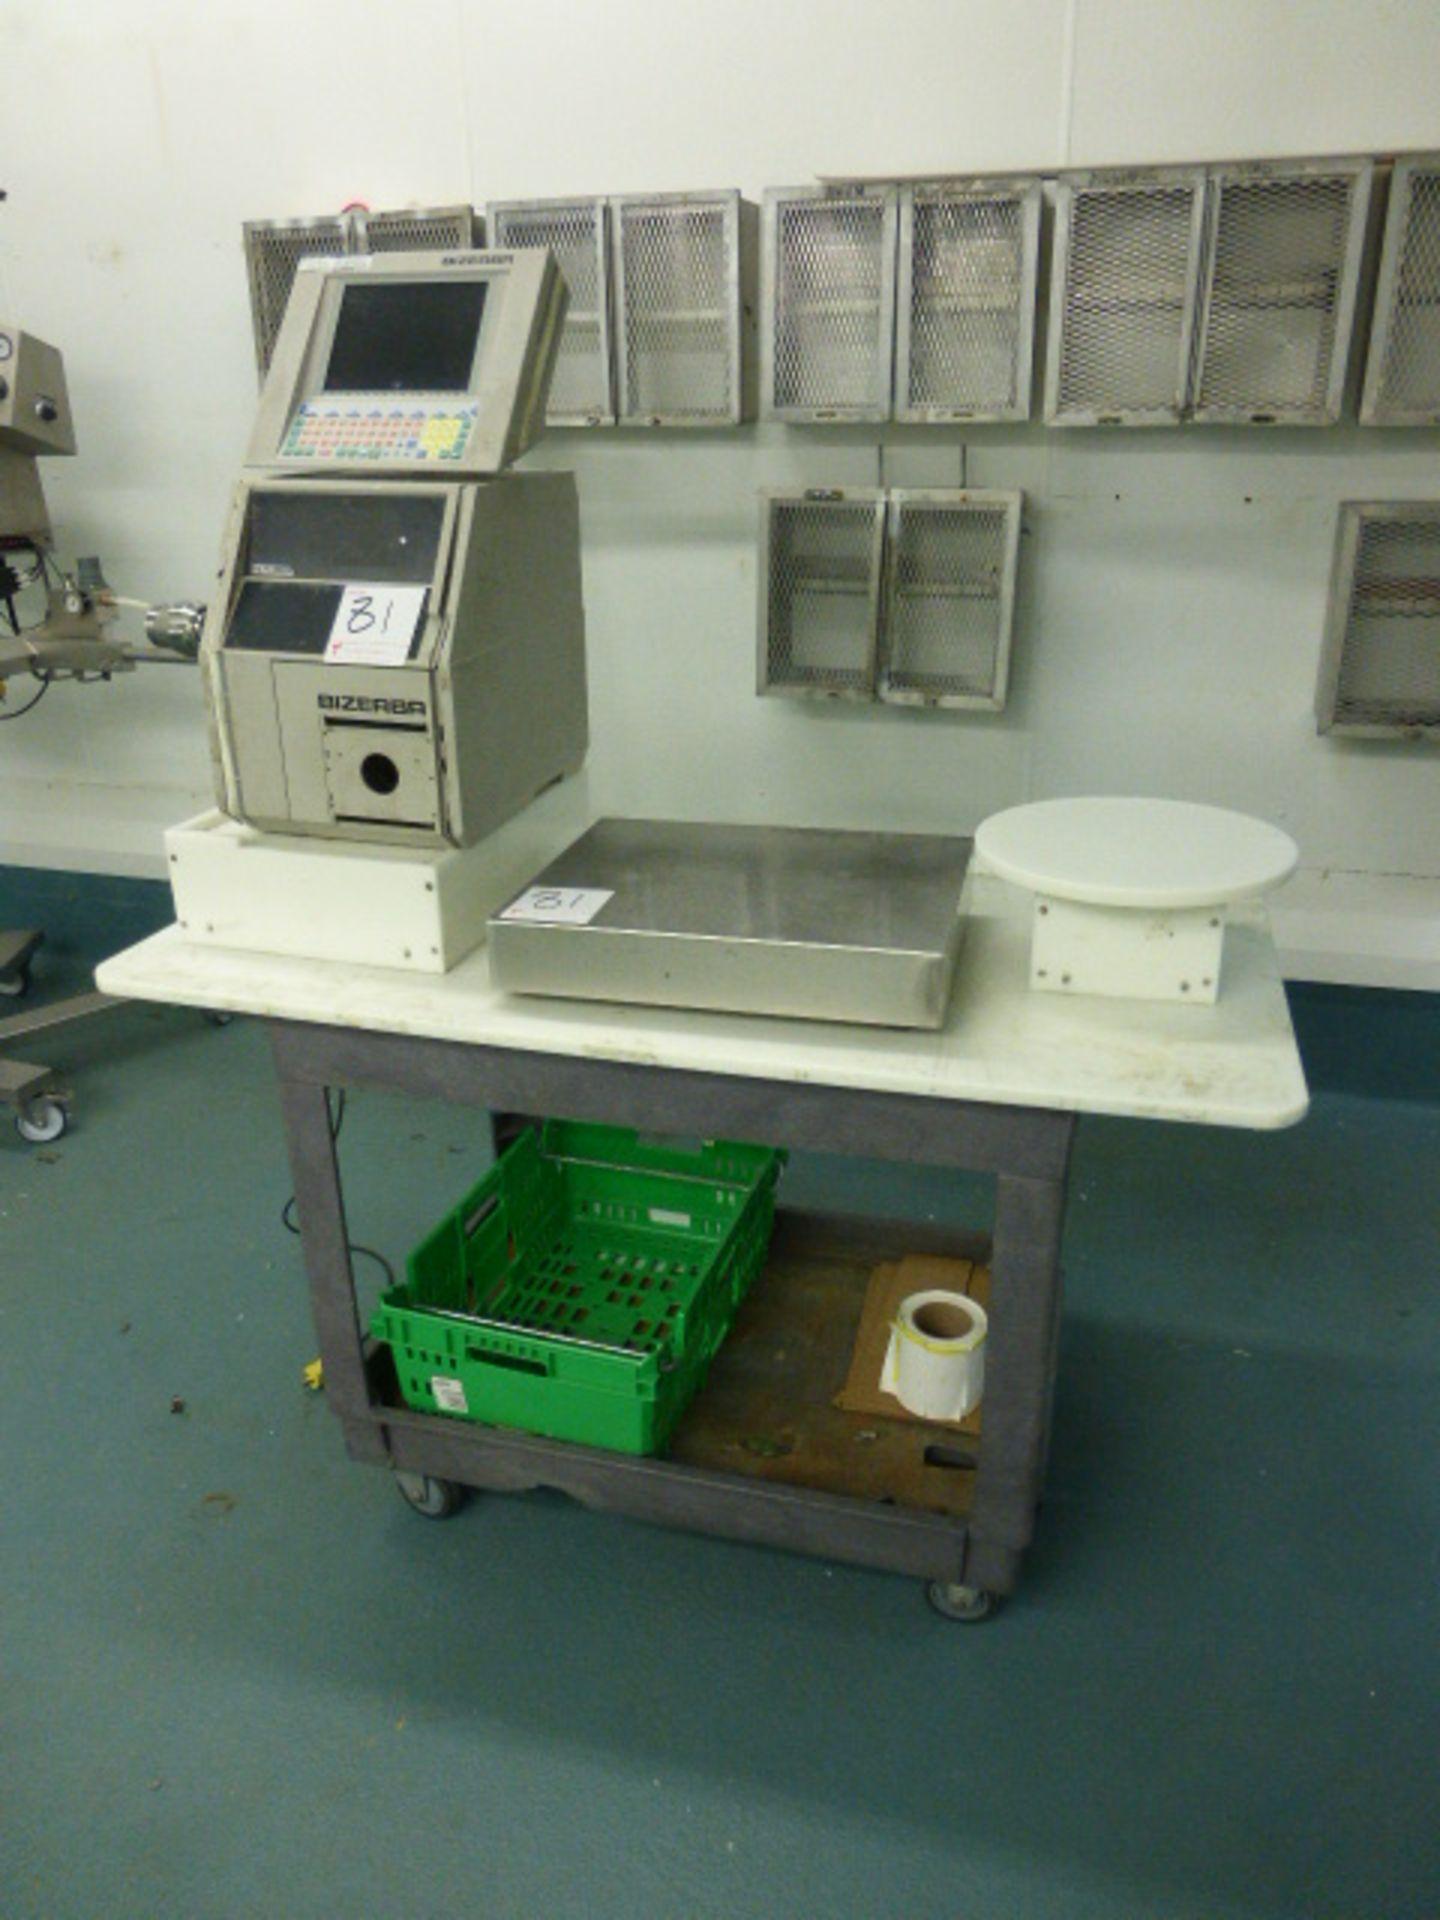 Bizerba check-weigher system w/ Bizerba GS label printer ser. no. 1945663 and Bizerba AB controller, - Image 2 of 2